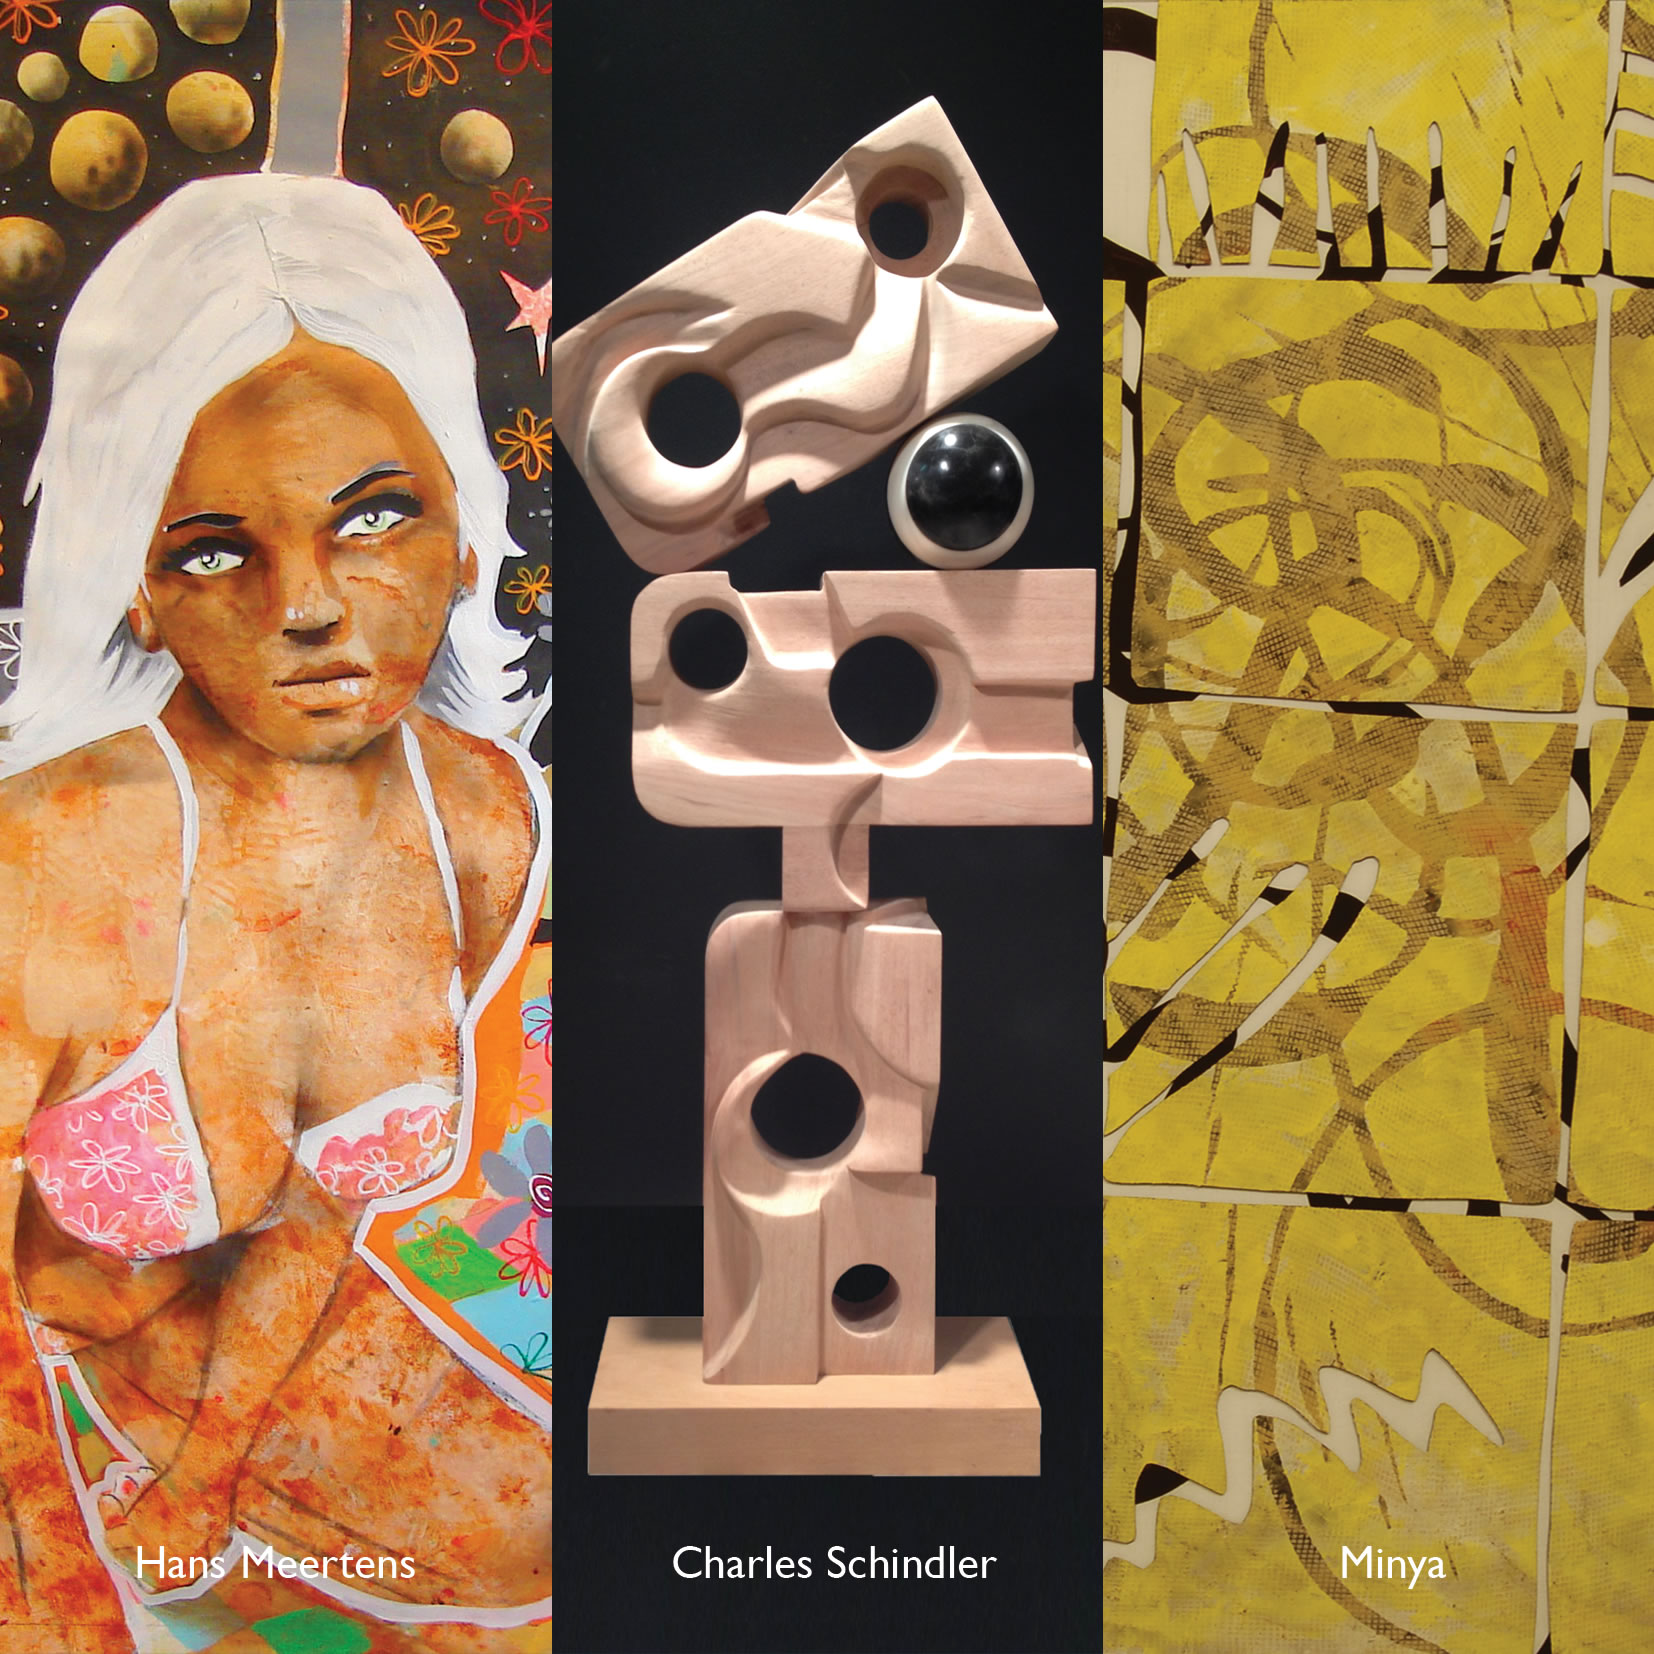 """Acquainted""   Hans Meertens -Minya -Charles Schindler  March 26 - April 11, 2015"